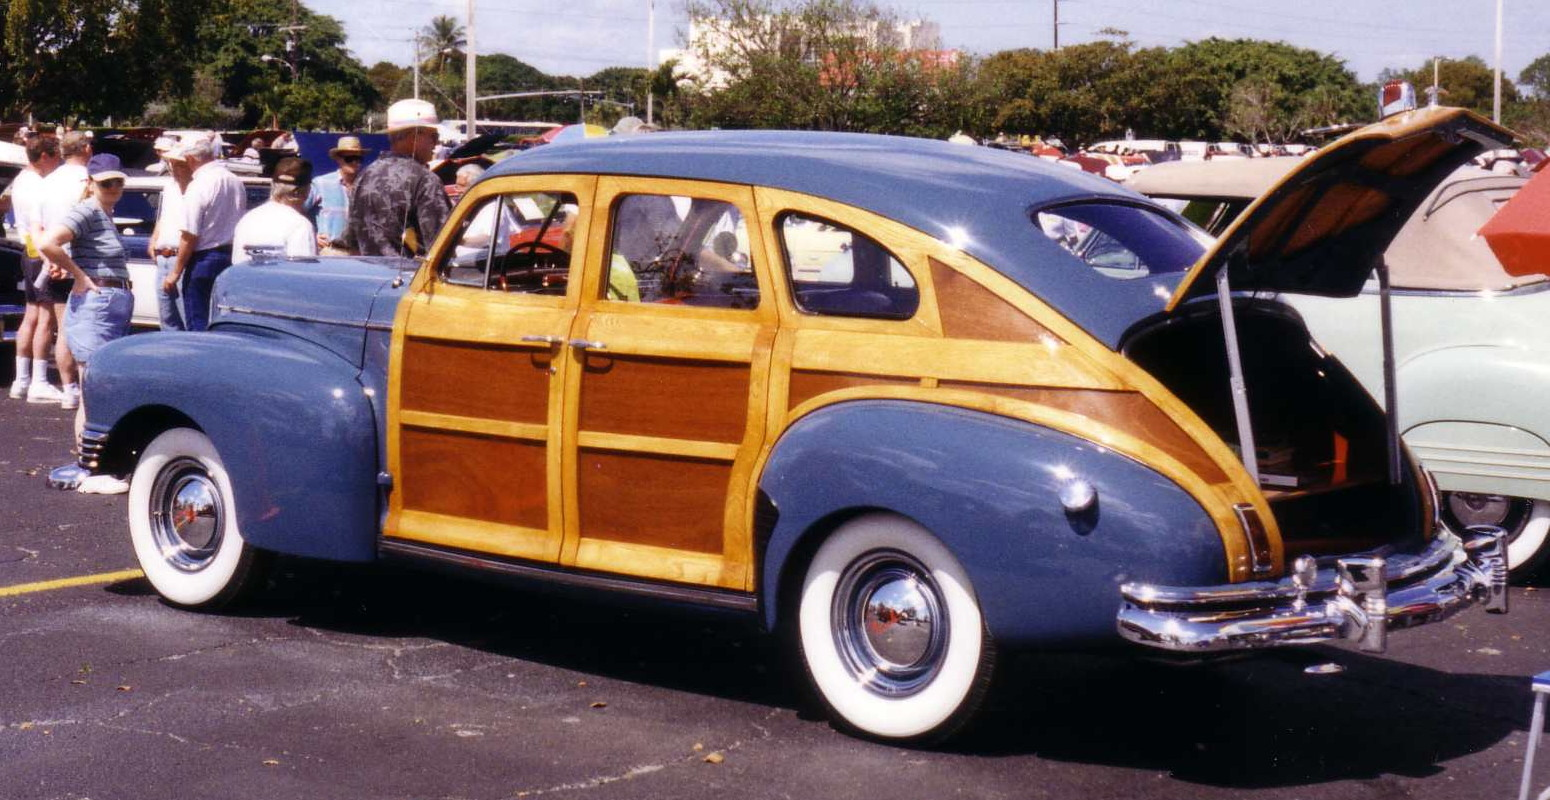 1934 Ford Station Wagon Woodie Phantom - Worldnews.com